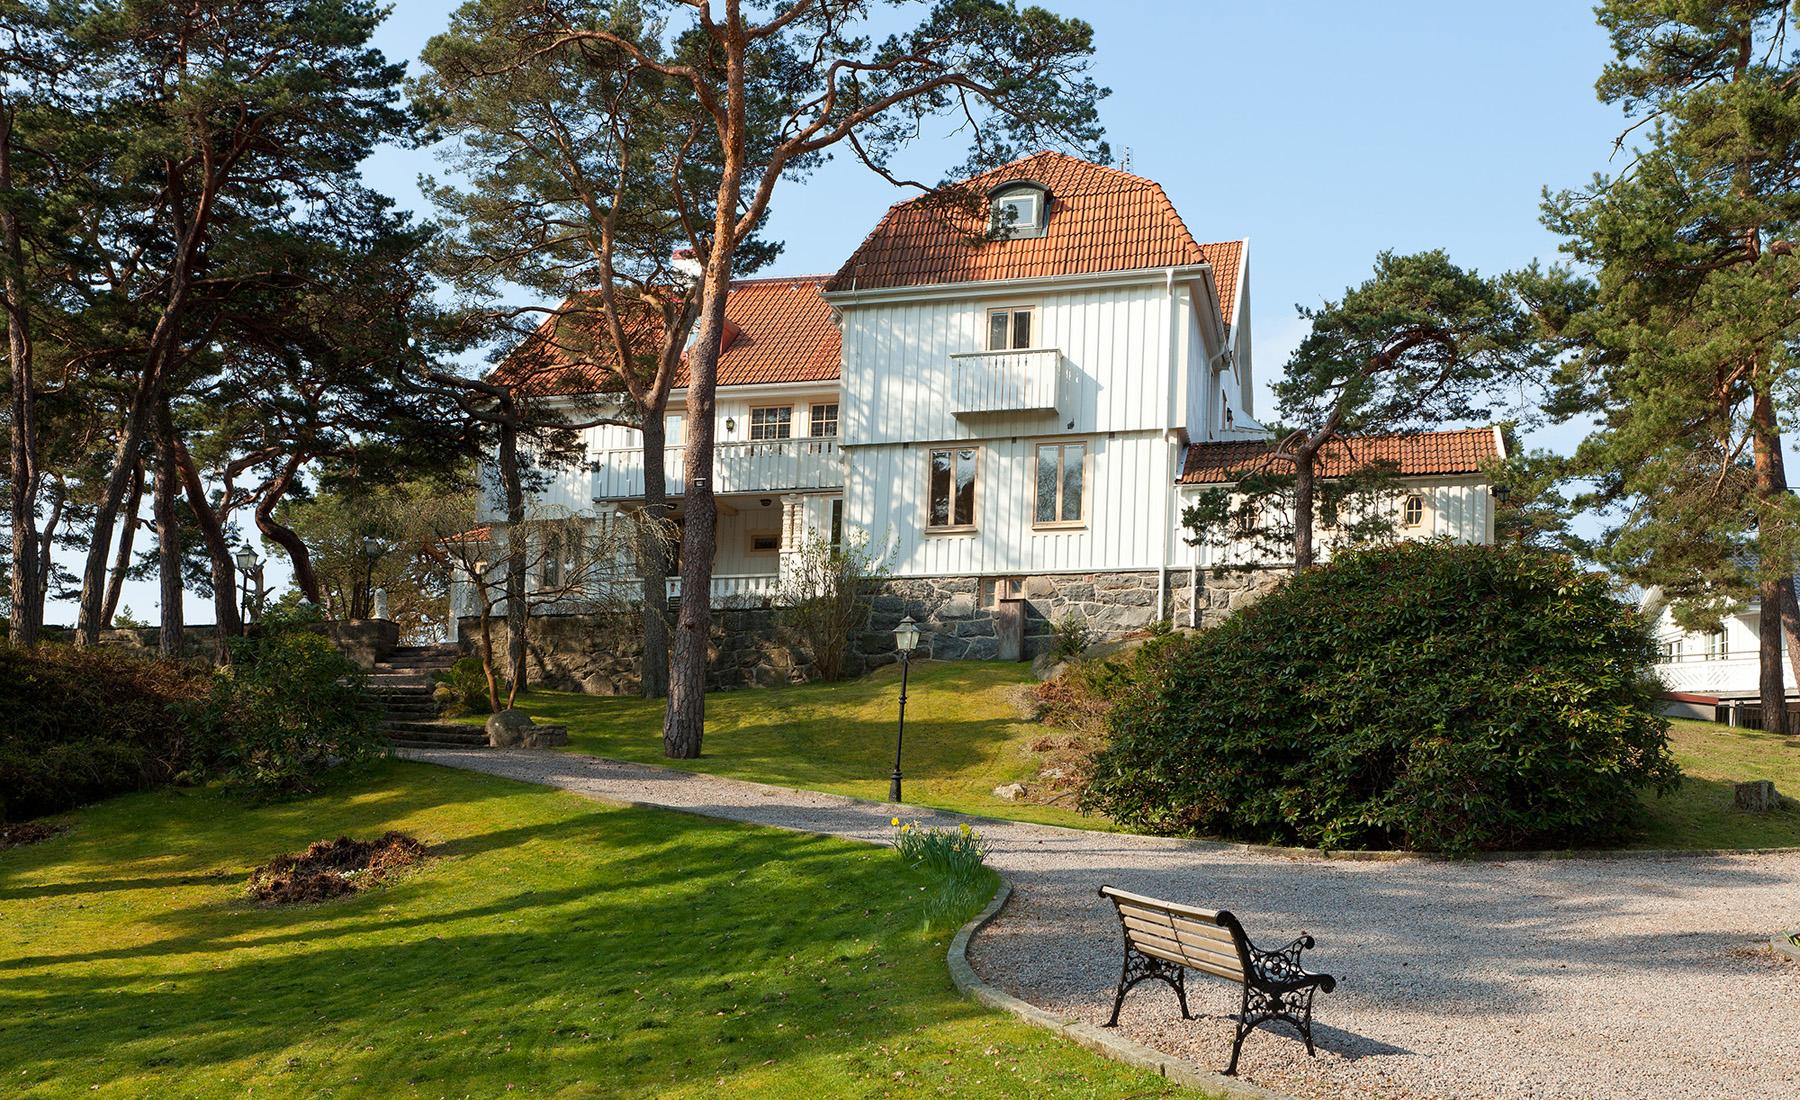 Single Family Home for Sale at Villa Furuhojd – Dan Brostrom's magnificent residence Dan Brostroms vag 18 Other Sweden, Other Areas In Sweden, 42943 Sweden